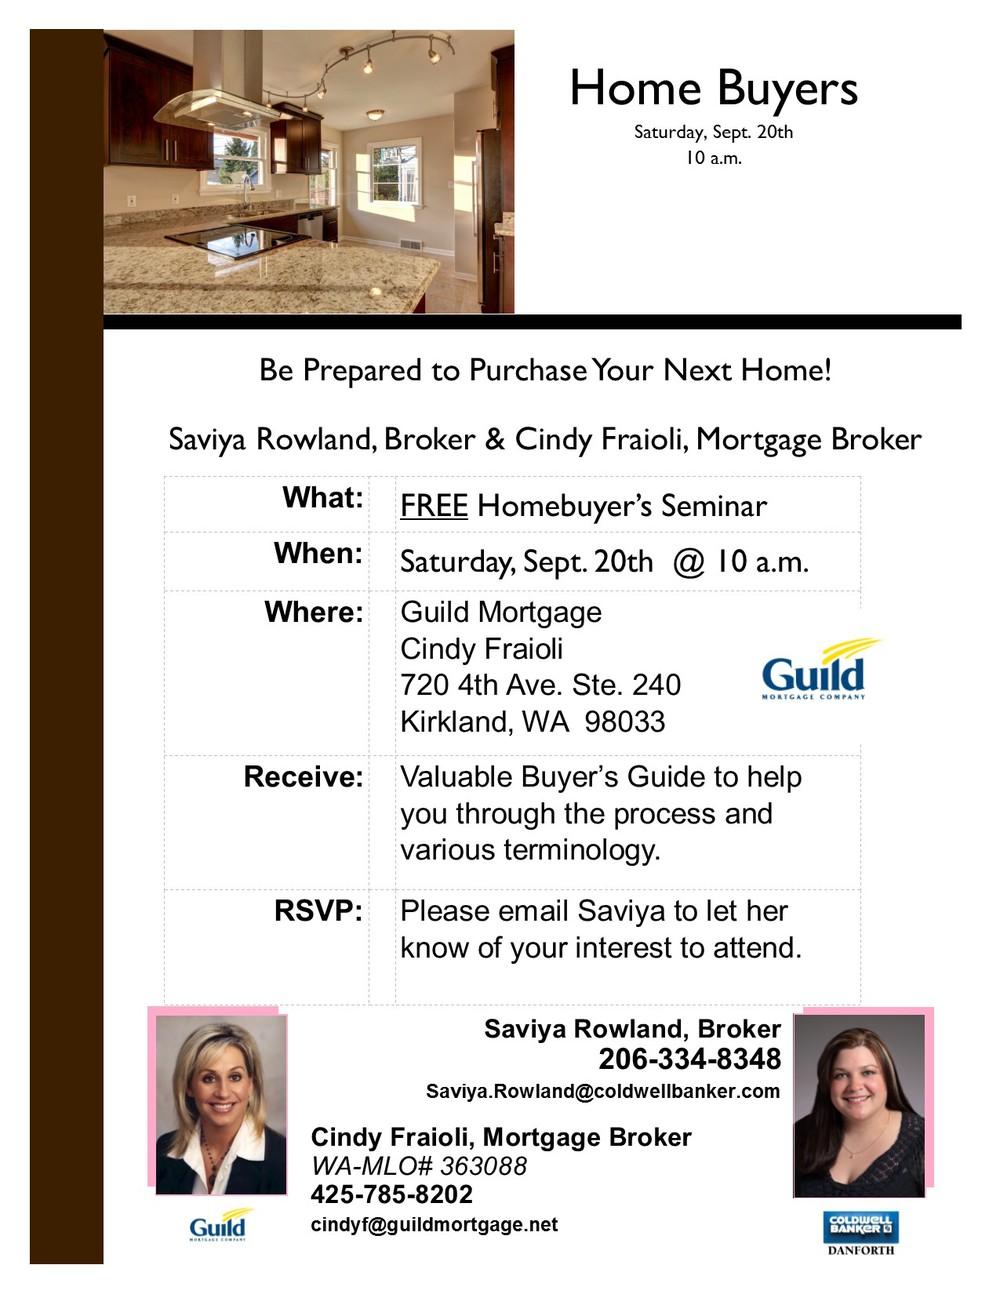 Saviya Home Buyer Invite Flyer GUILD 9-20-14.jpg